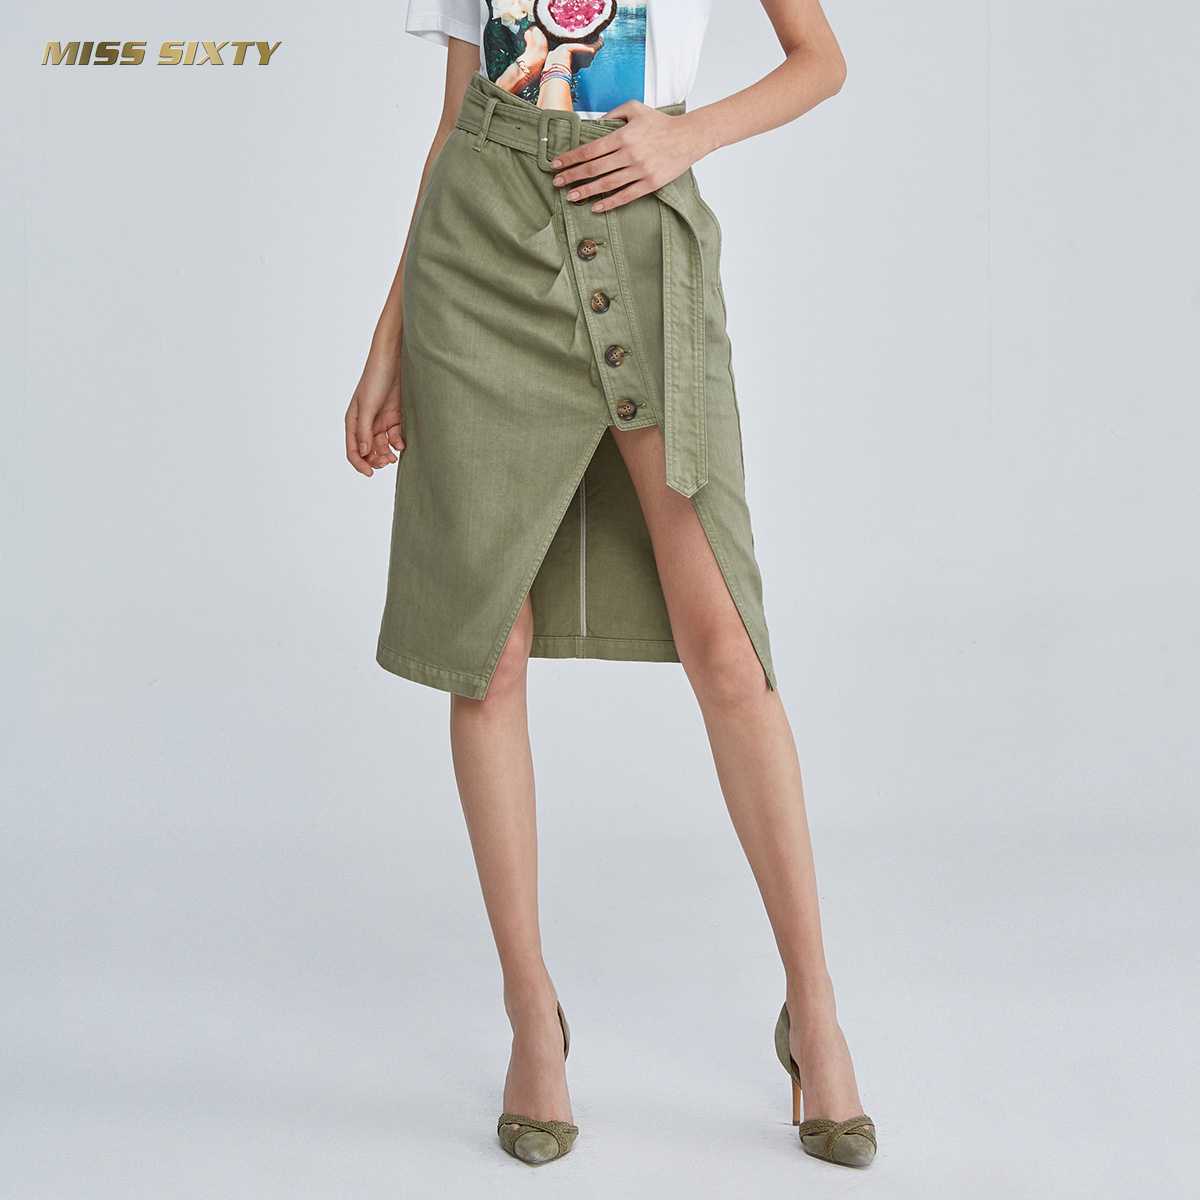 C Miss Sixty2018新款夏季排扣高腰長裙牛仔半身裙女682KJ1830000